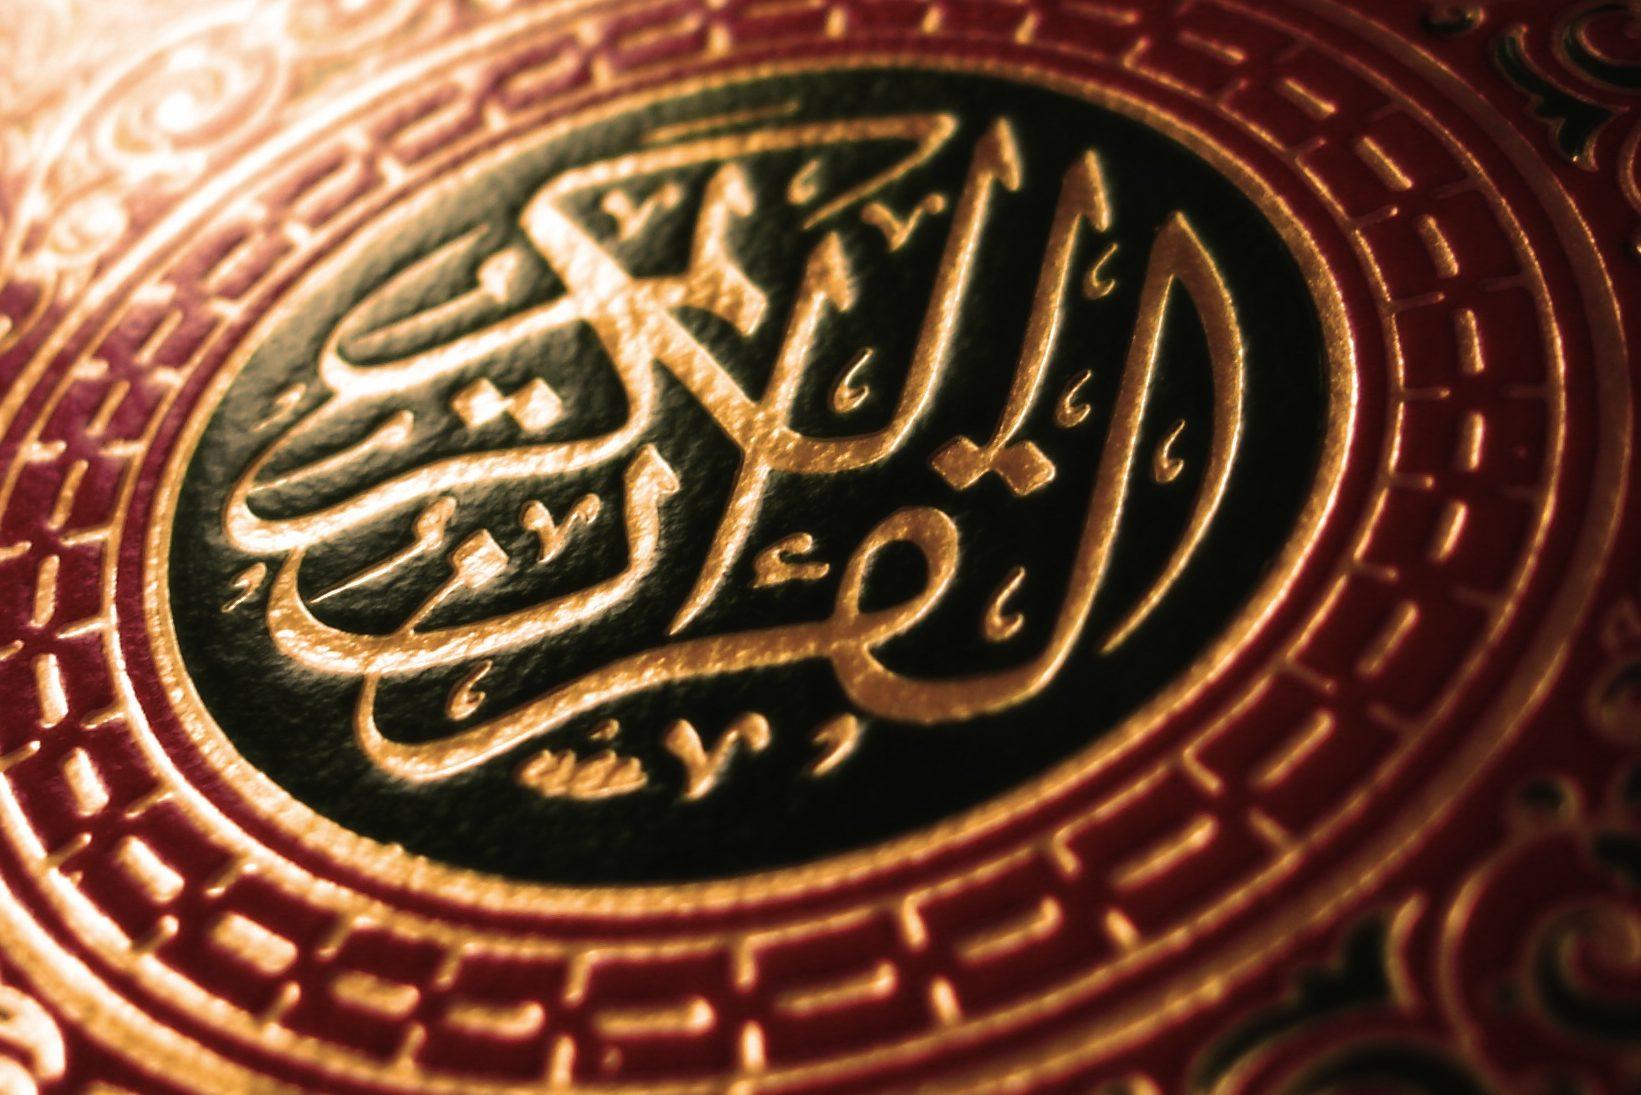 Das heilige Buch der Muslime: der Koran. Foto: crystalina/Wikimedia Commons (CC-BY-2.0)